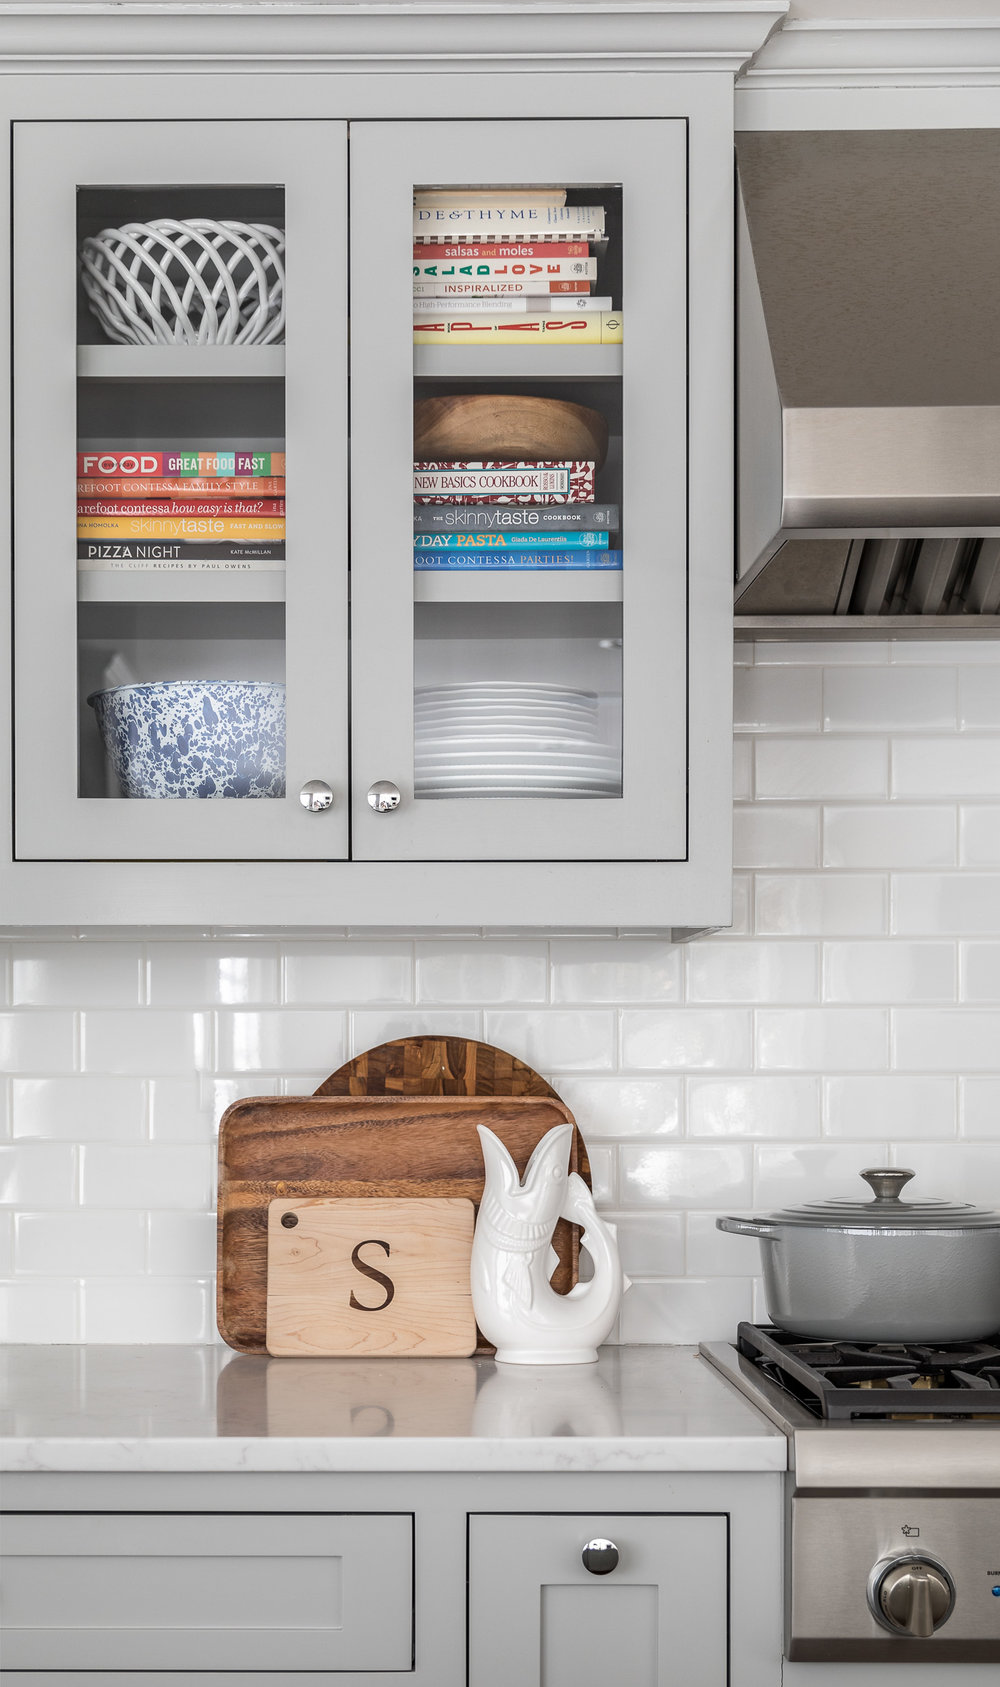 Kitchen decor accessories in a coastal design Fairfield County,